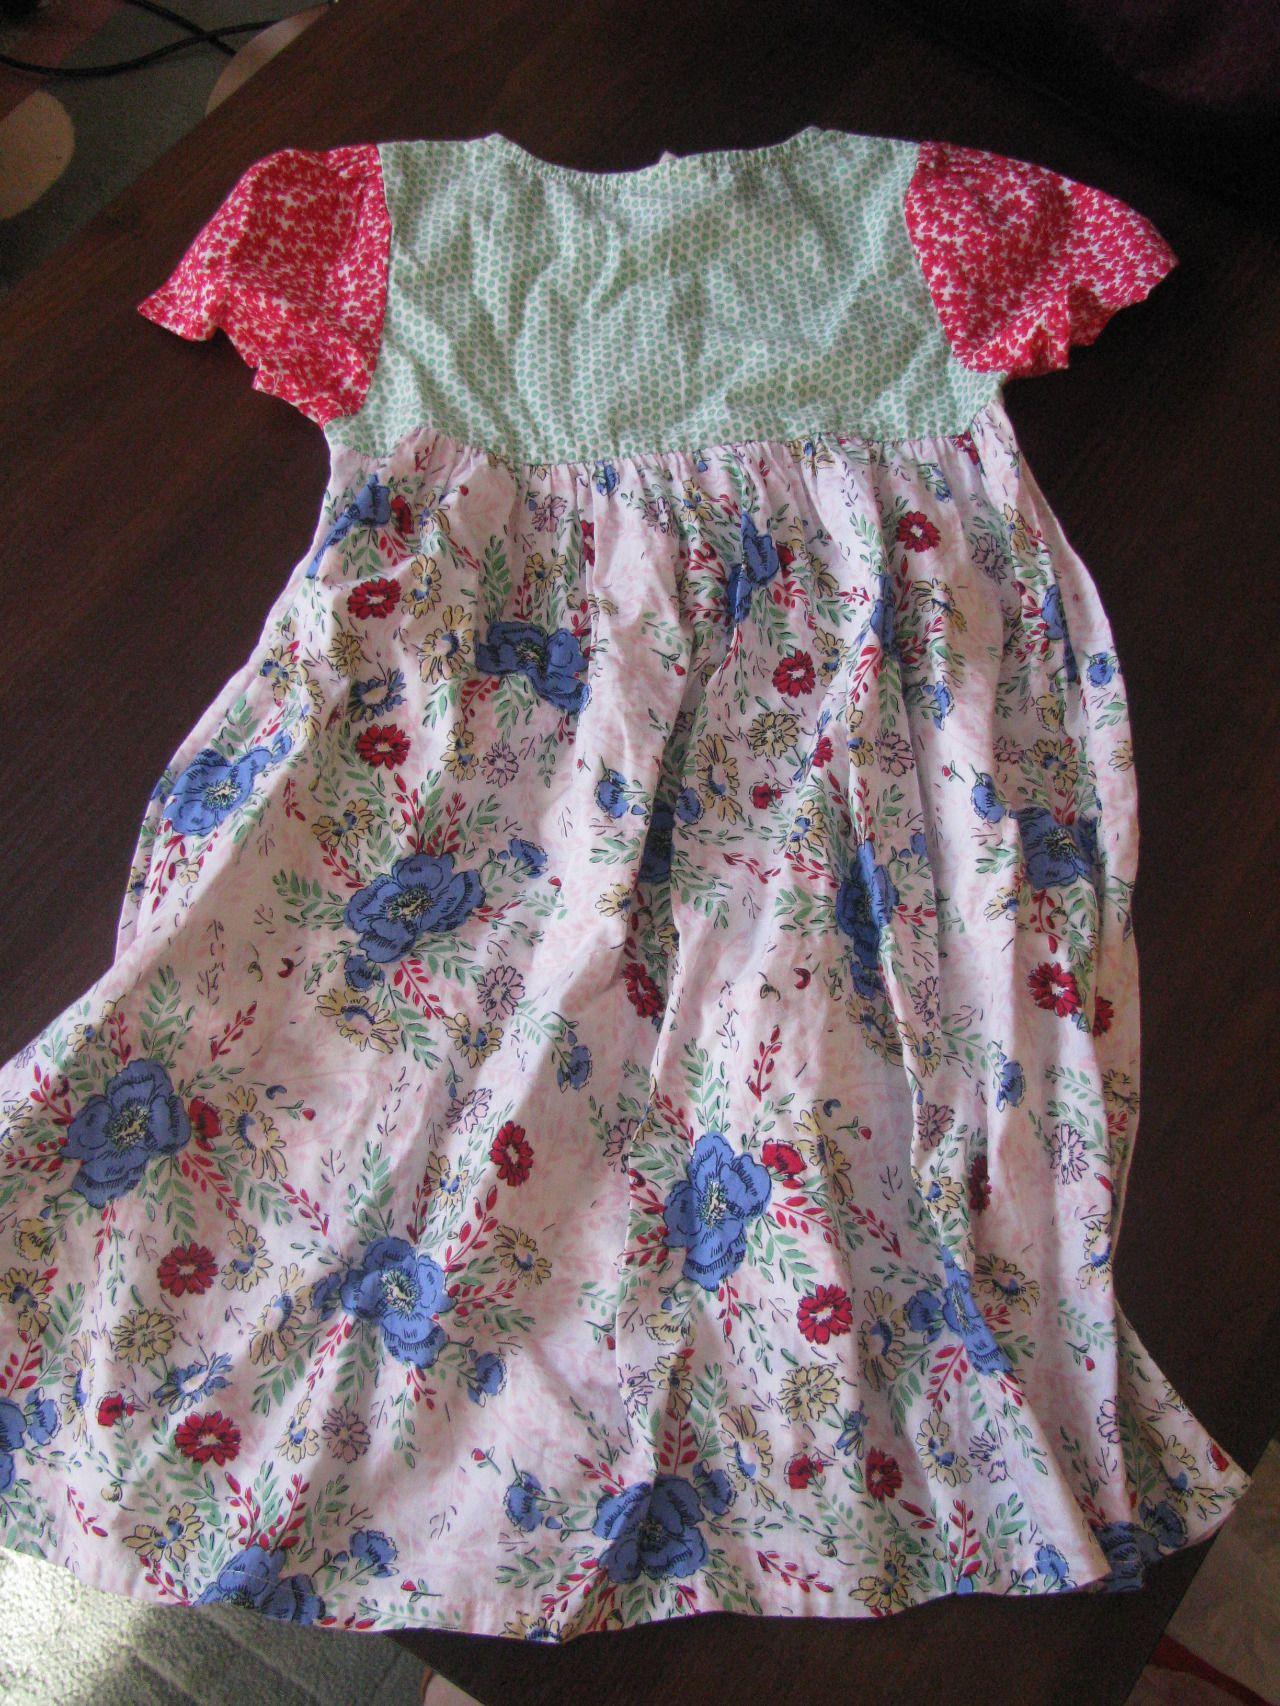 e3f4bb6e77 Śliczna Letnia  Sukienka 5 122 CM - 7111950658 - oficjalne archiwum ...